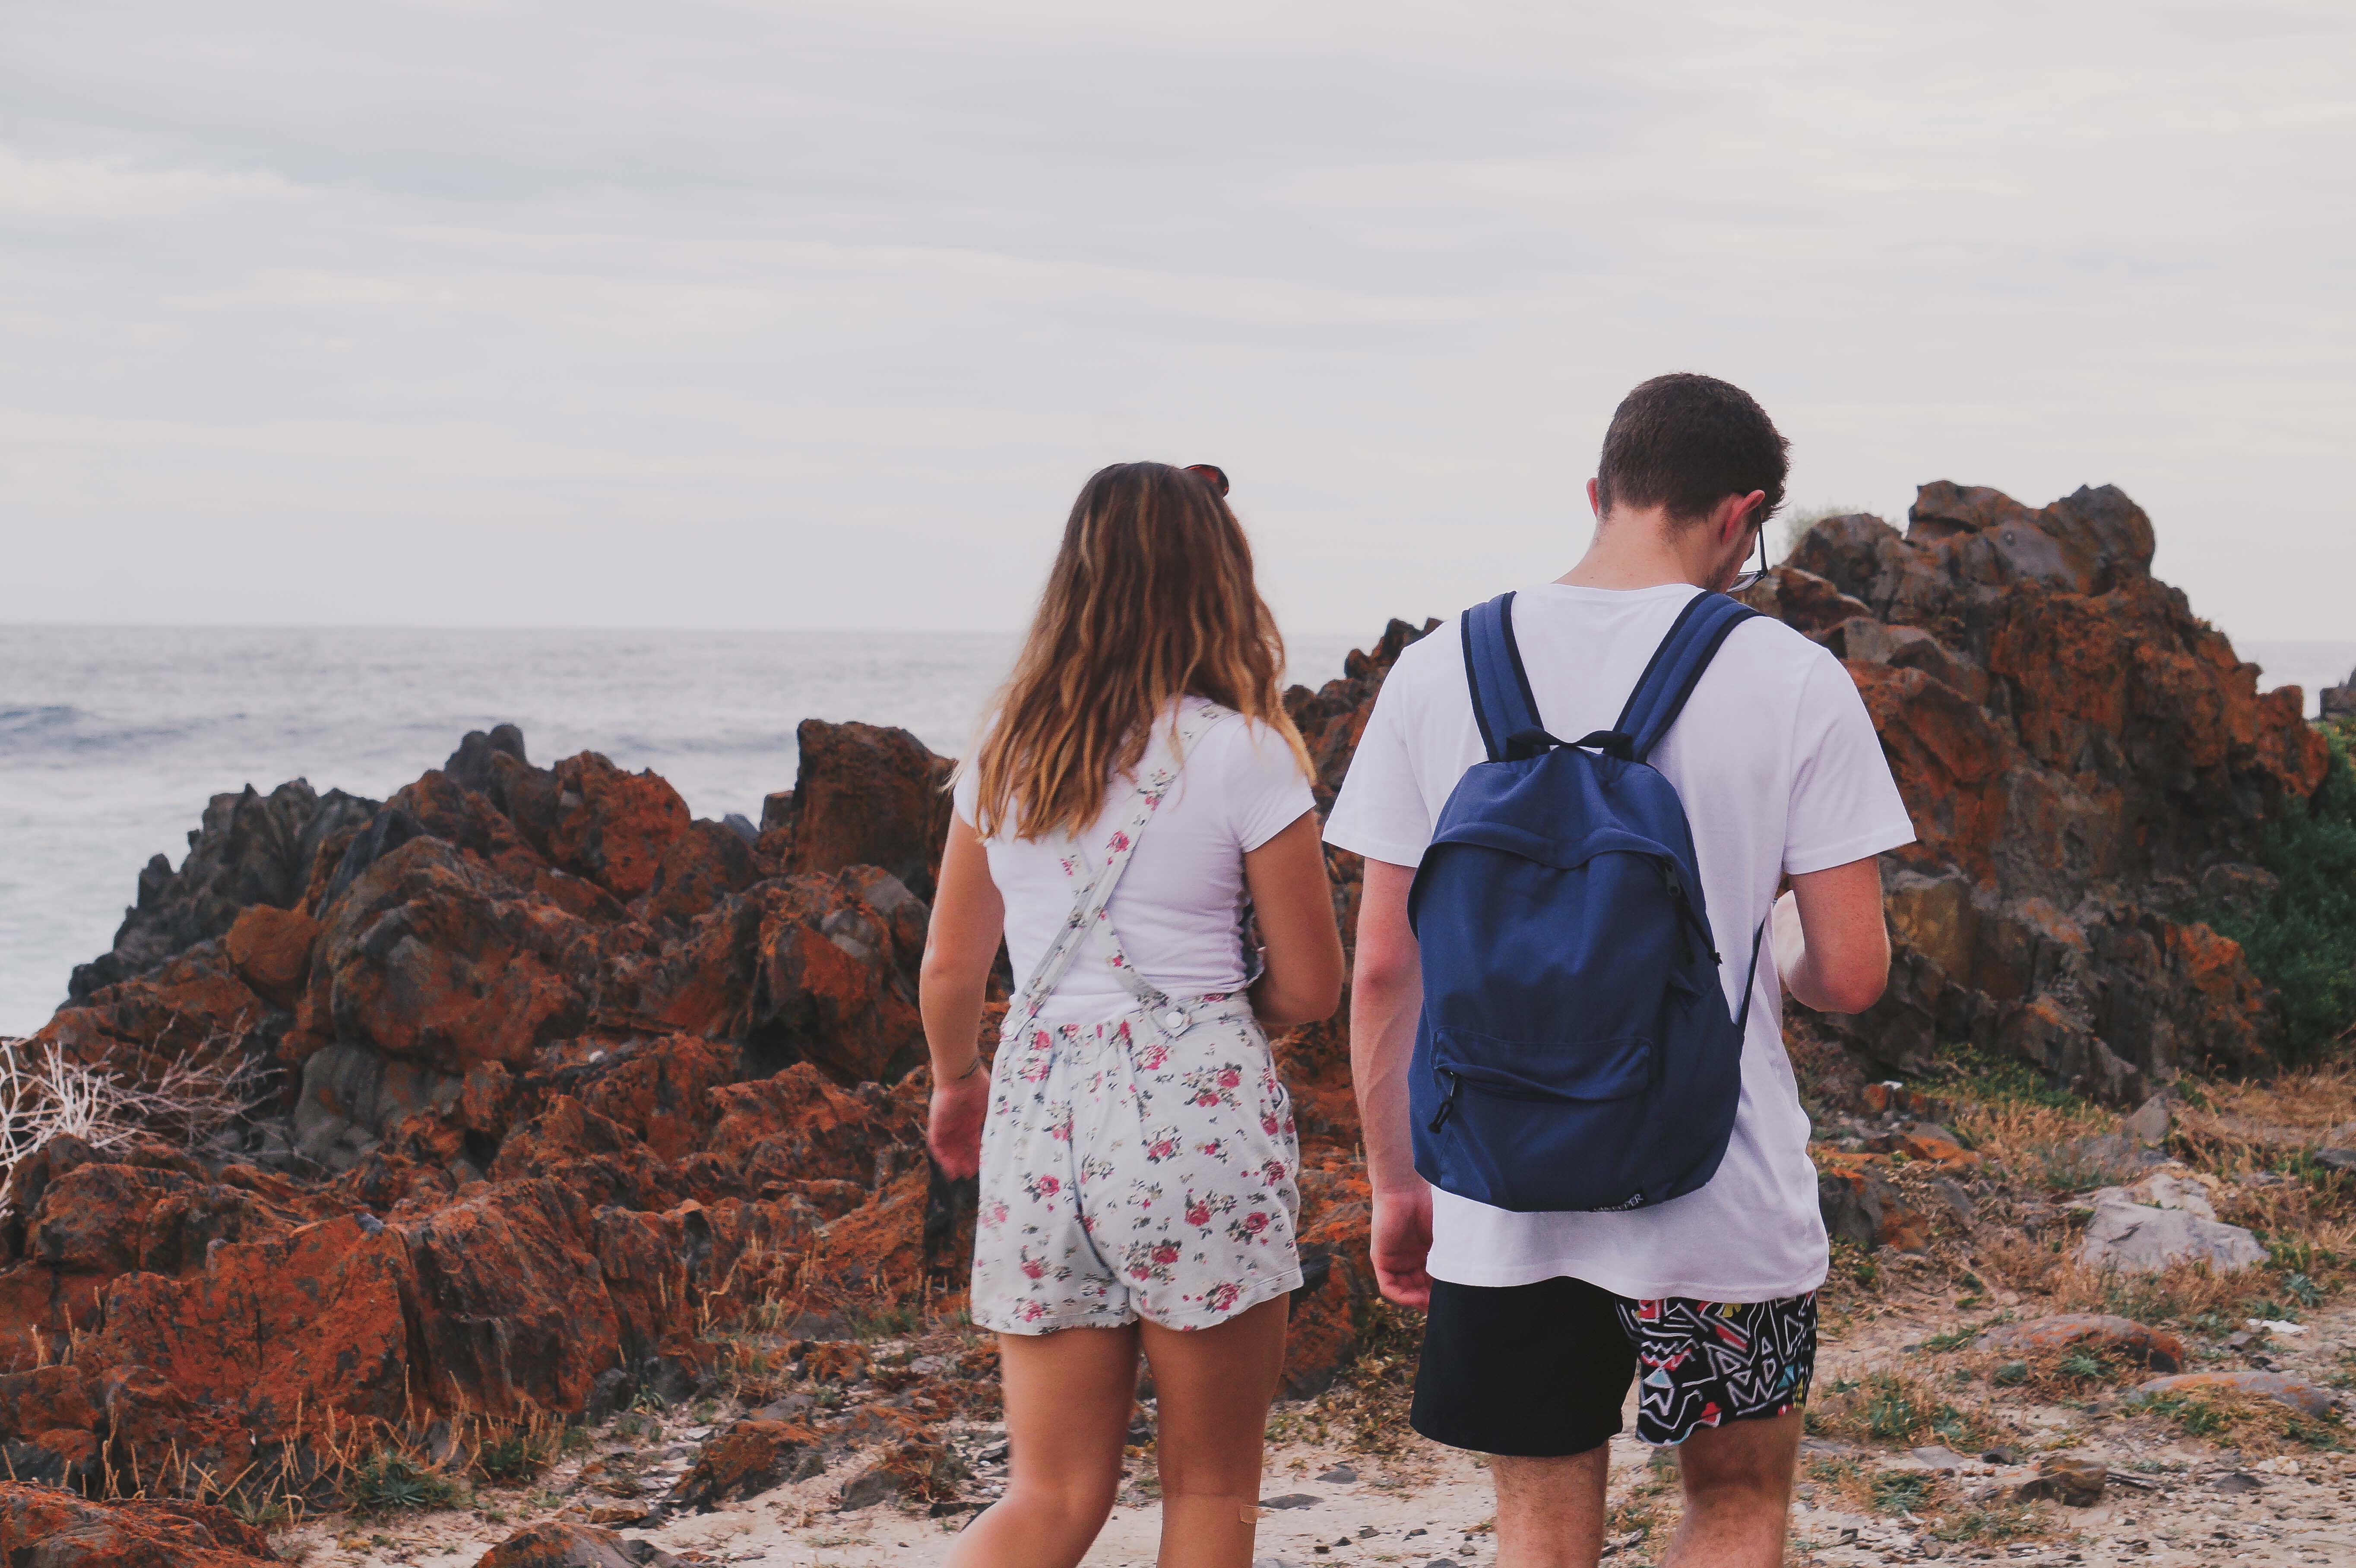 Third date ideas - couple exploring